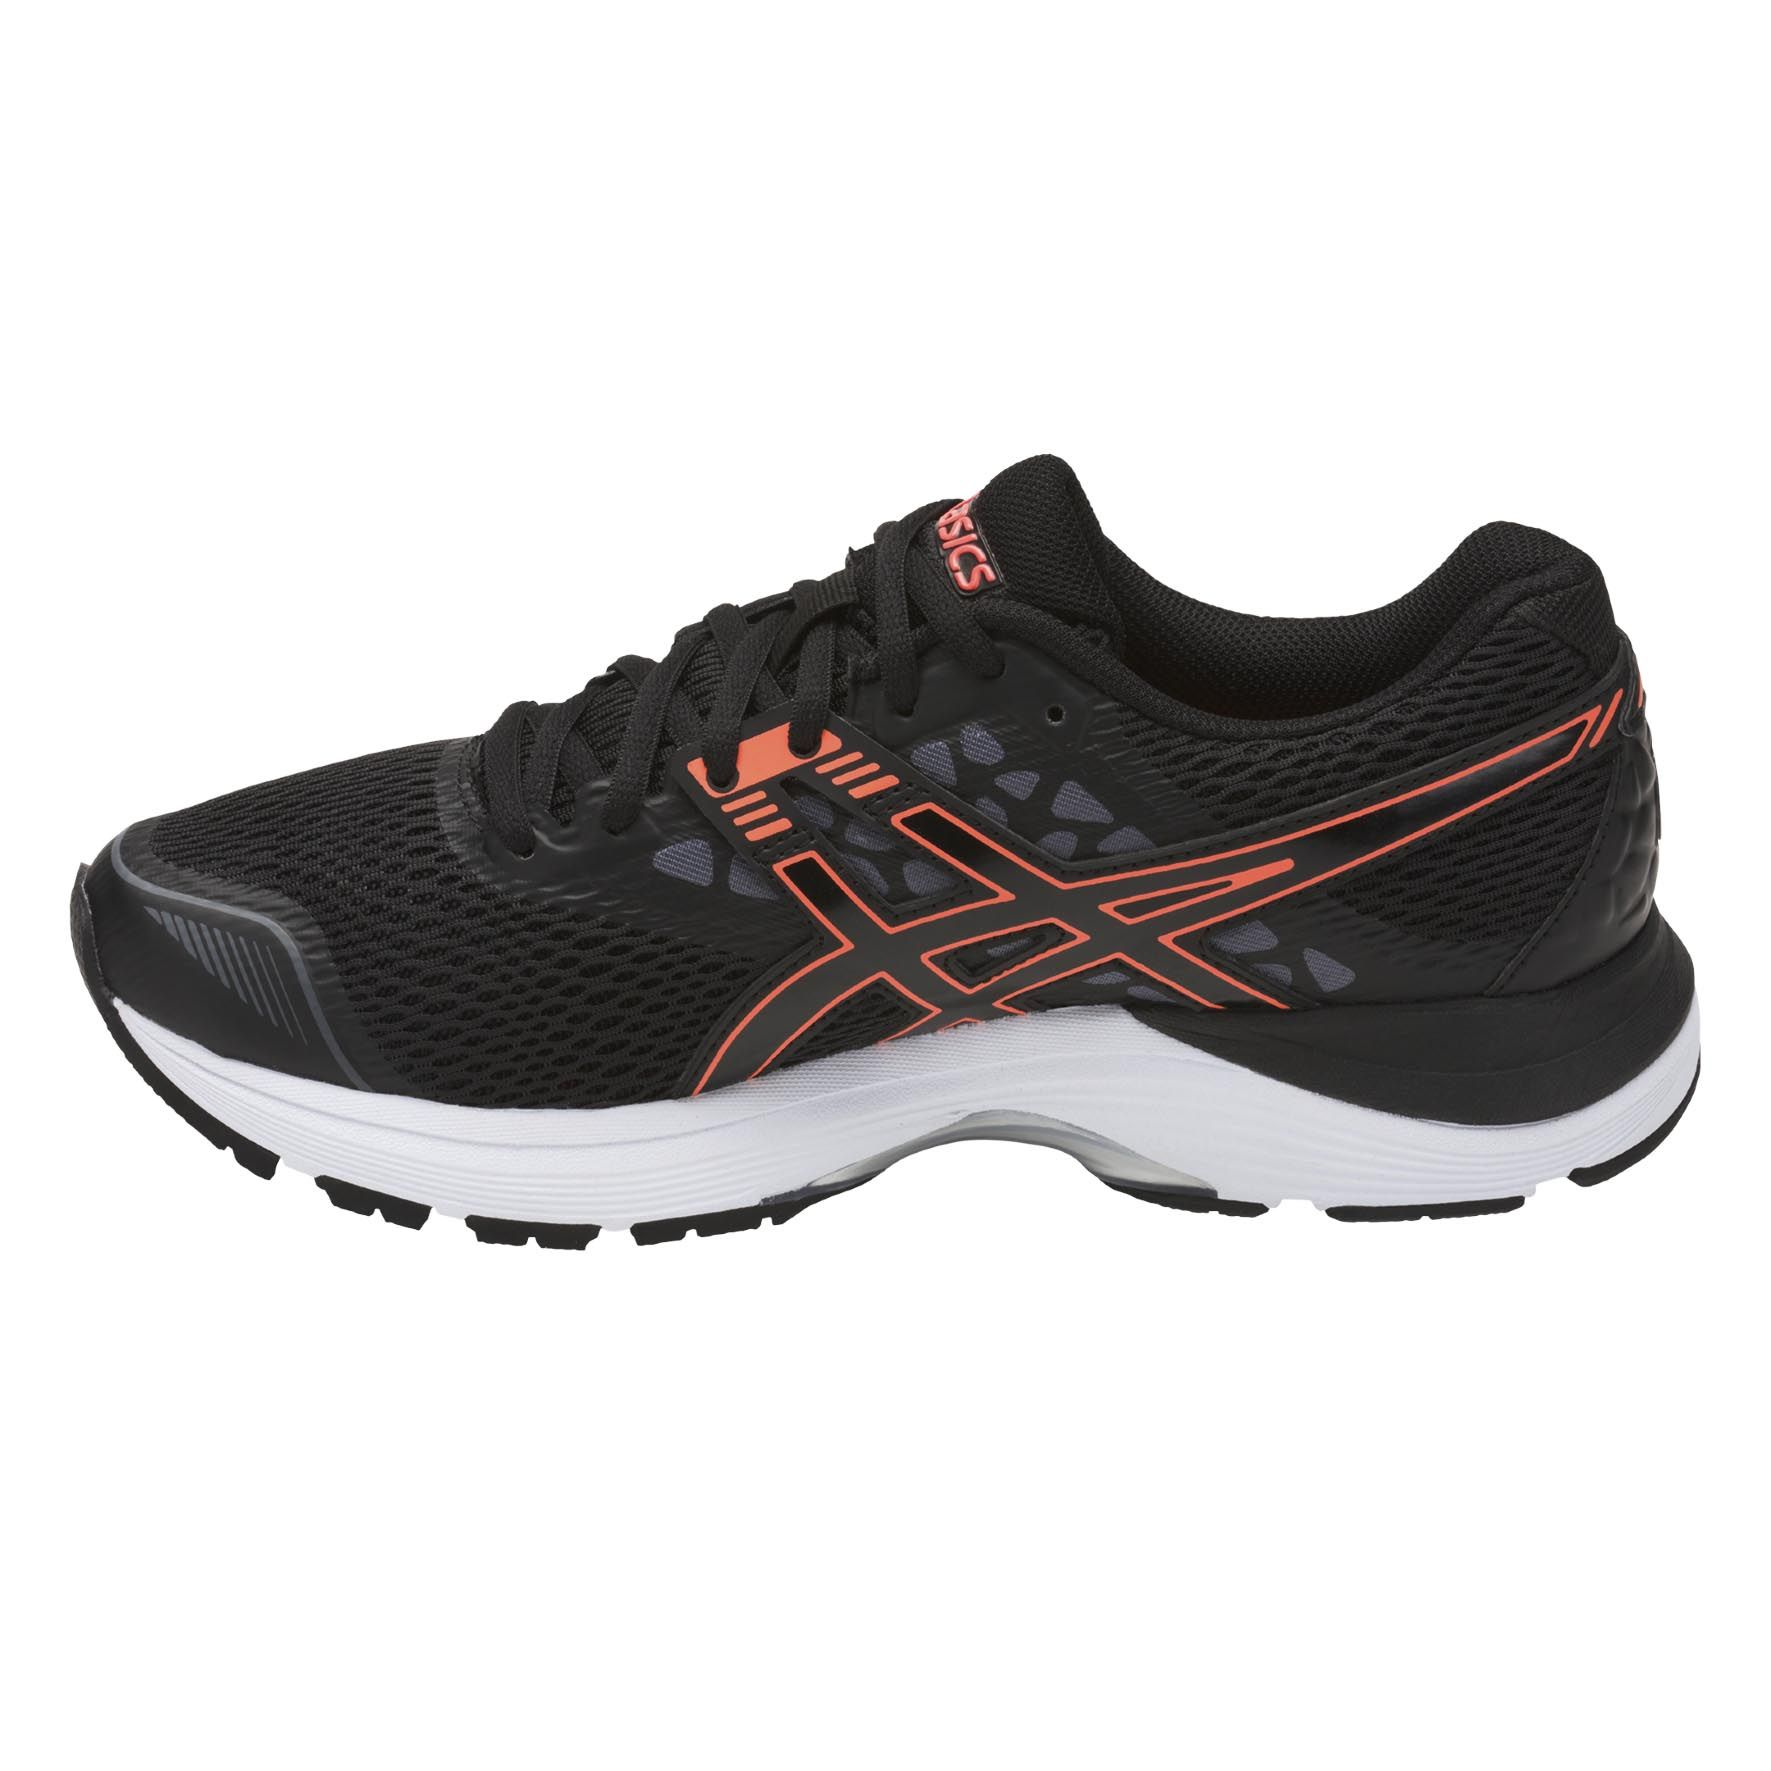 Asics Gel Pulse  Ladies Running Shoes